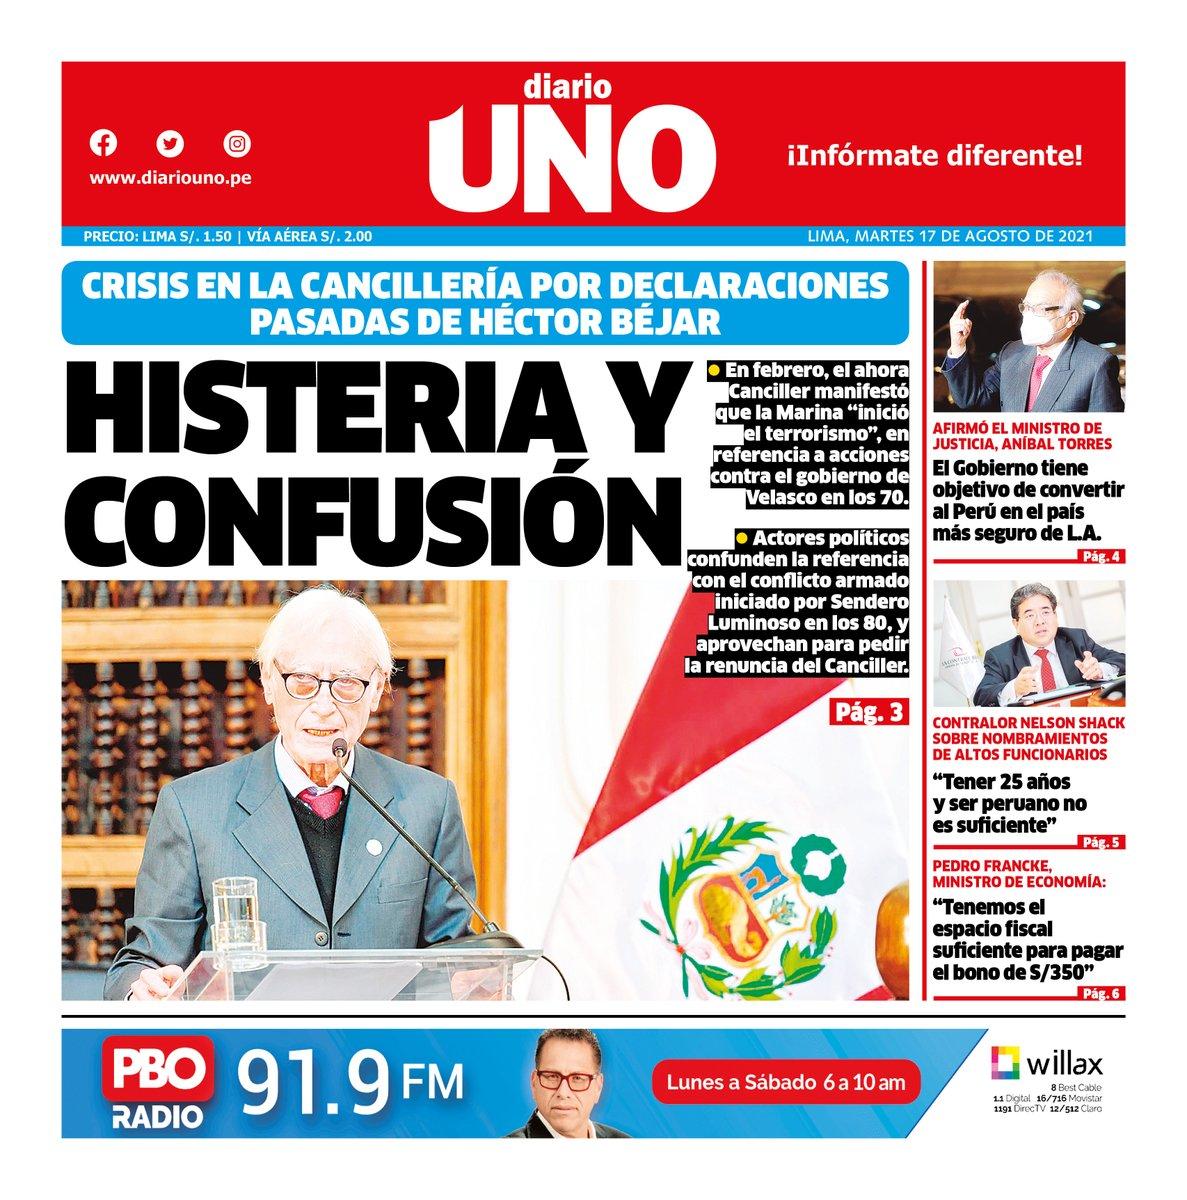 Diario UNO (@DiarioUnoPeru) | Twitter